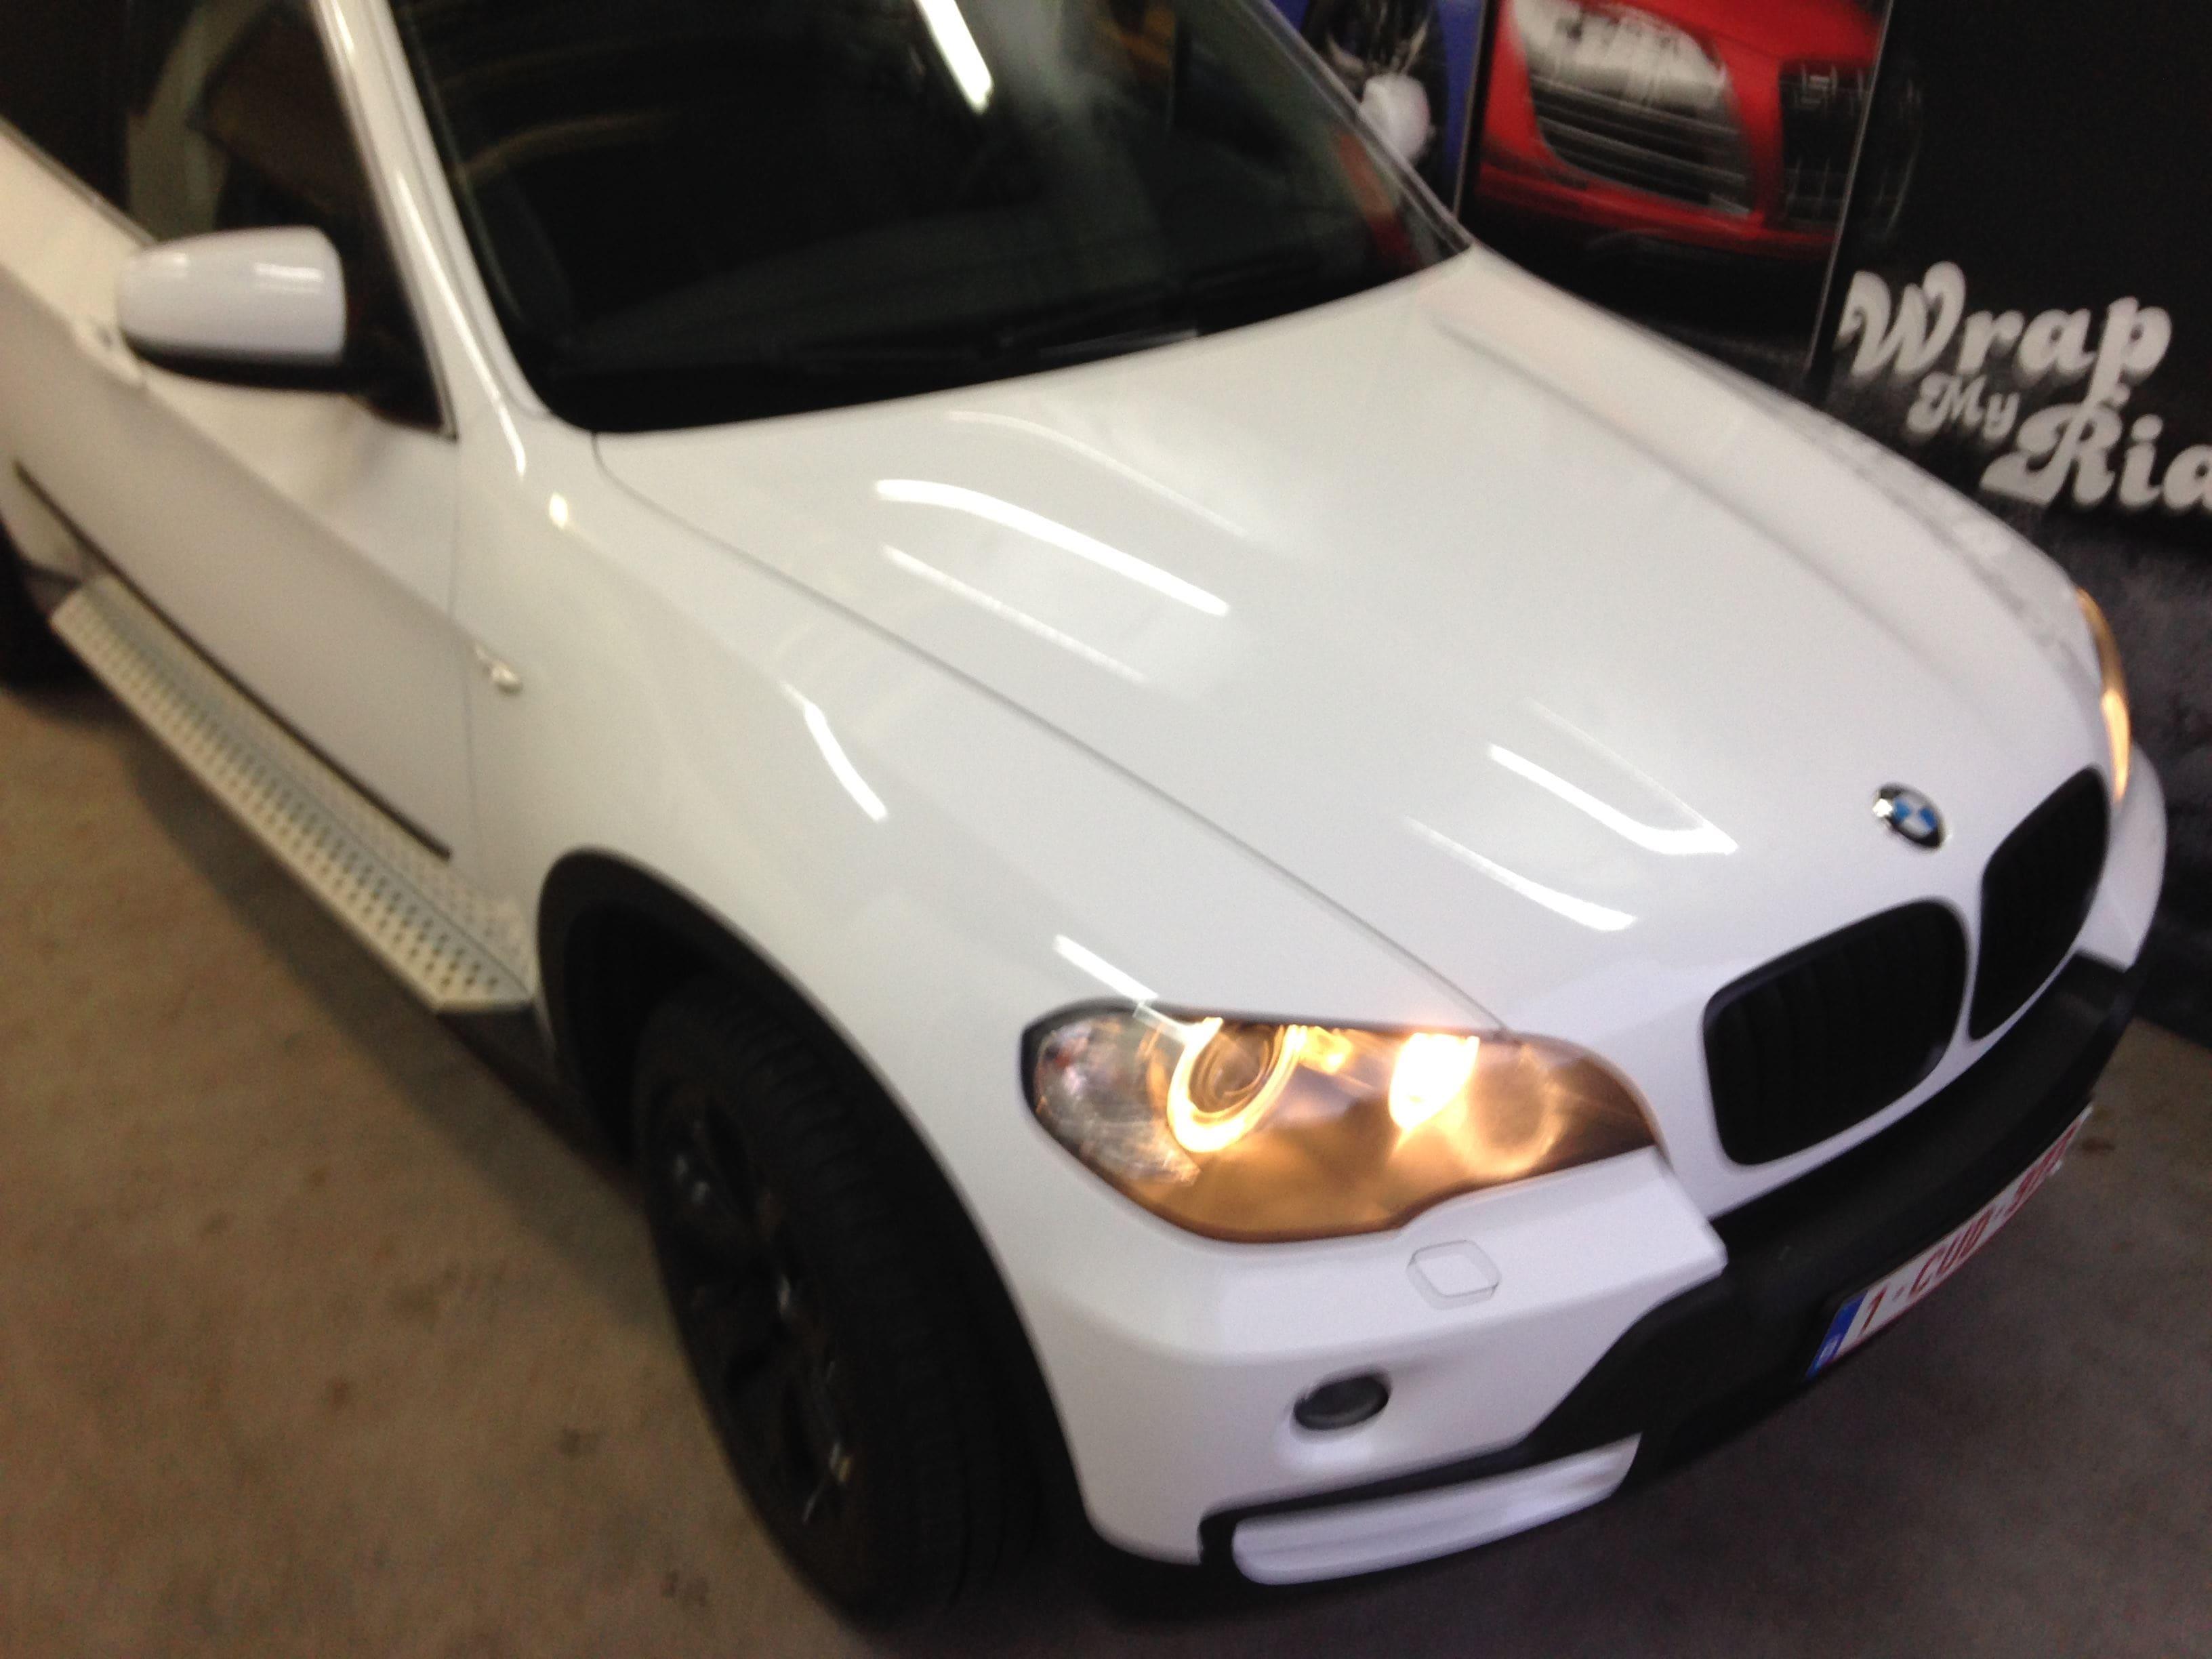 BMW X5 met Glossy White Wrap, Carwrapping door Wrapmyride.nu Foto-nr:5431, ©2021